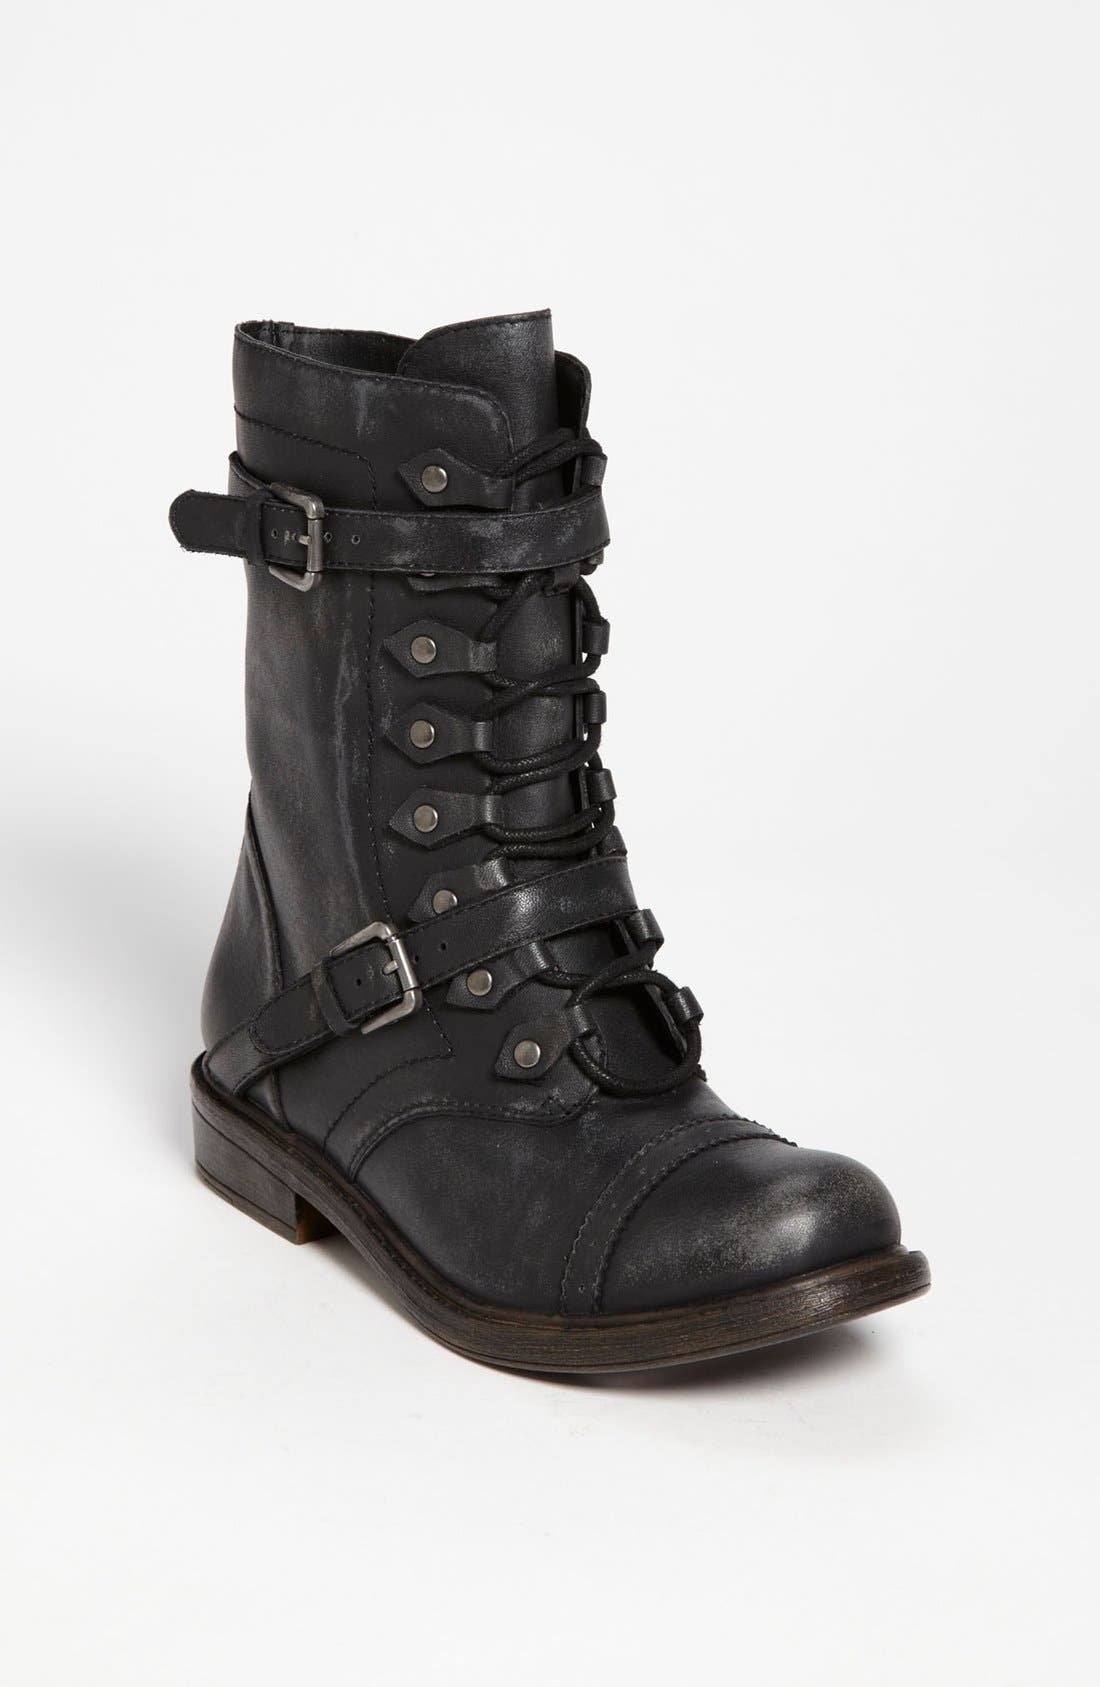 Alternate Image 1 Selected - ZiGi girl 'Tactical' Boot (Online Only)